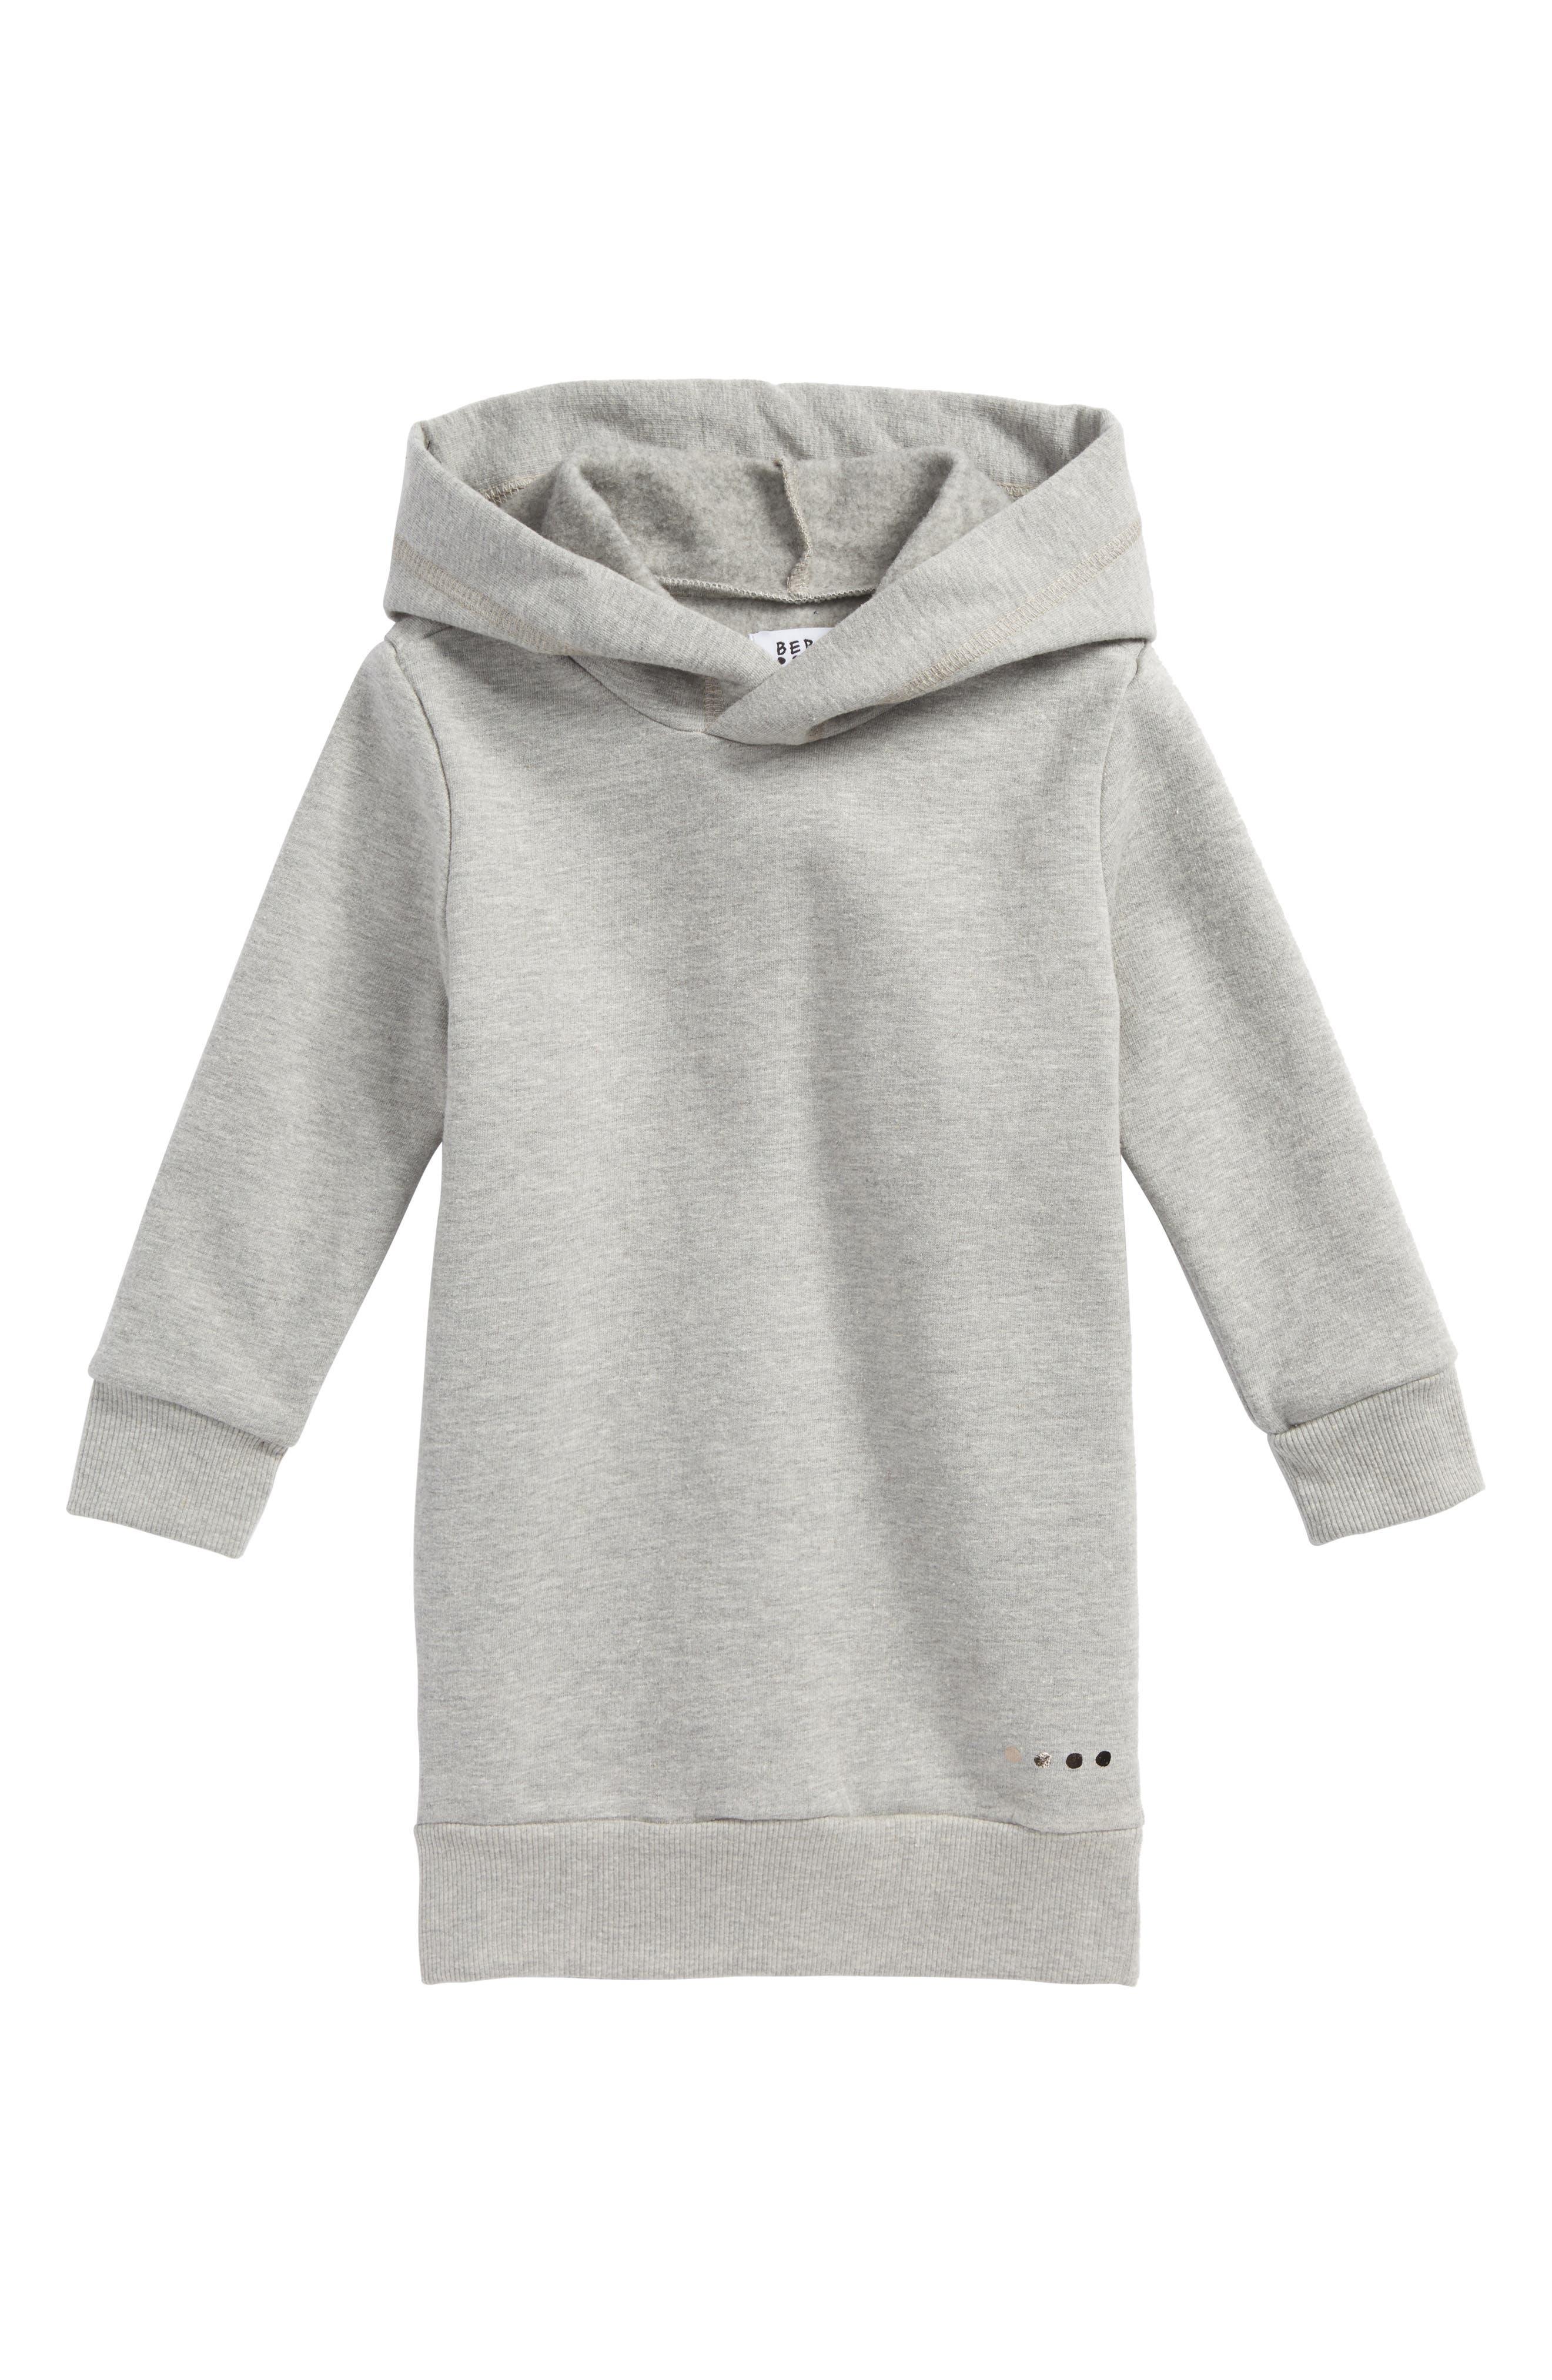 Luna Hooded Sweatshirt Dress,                         Main,                         color, 050